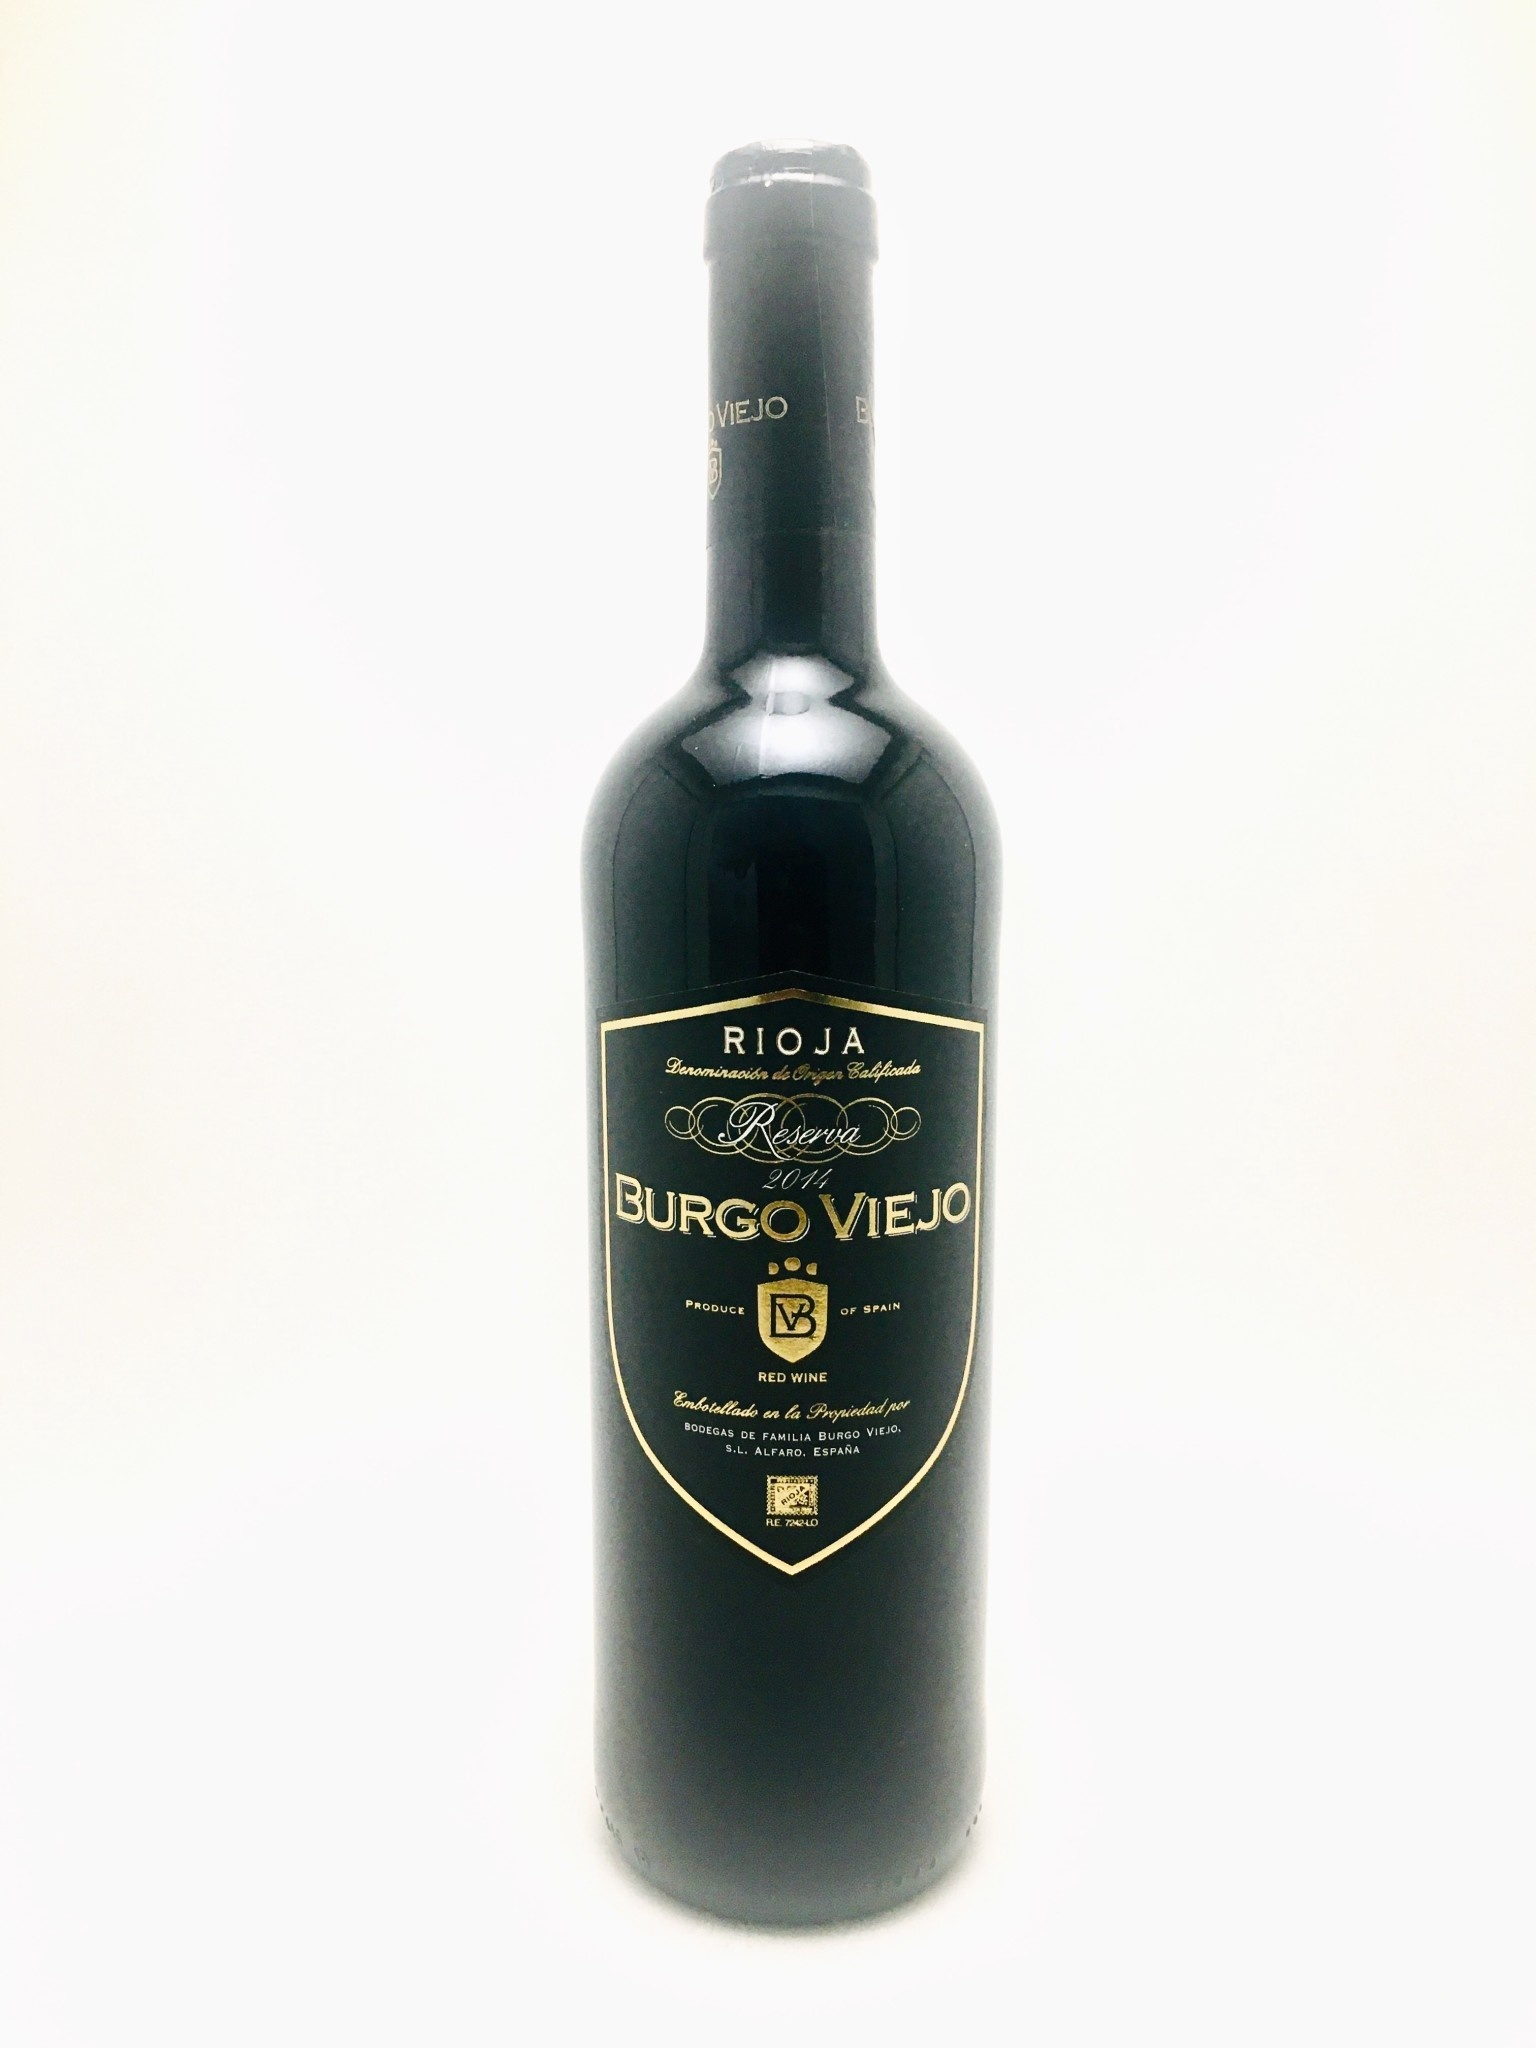 Burgo Viejo Reserva Rioja DOCa Spain 2014